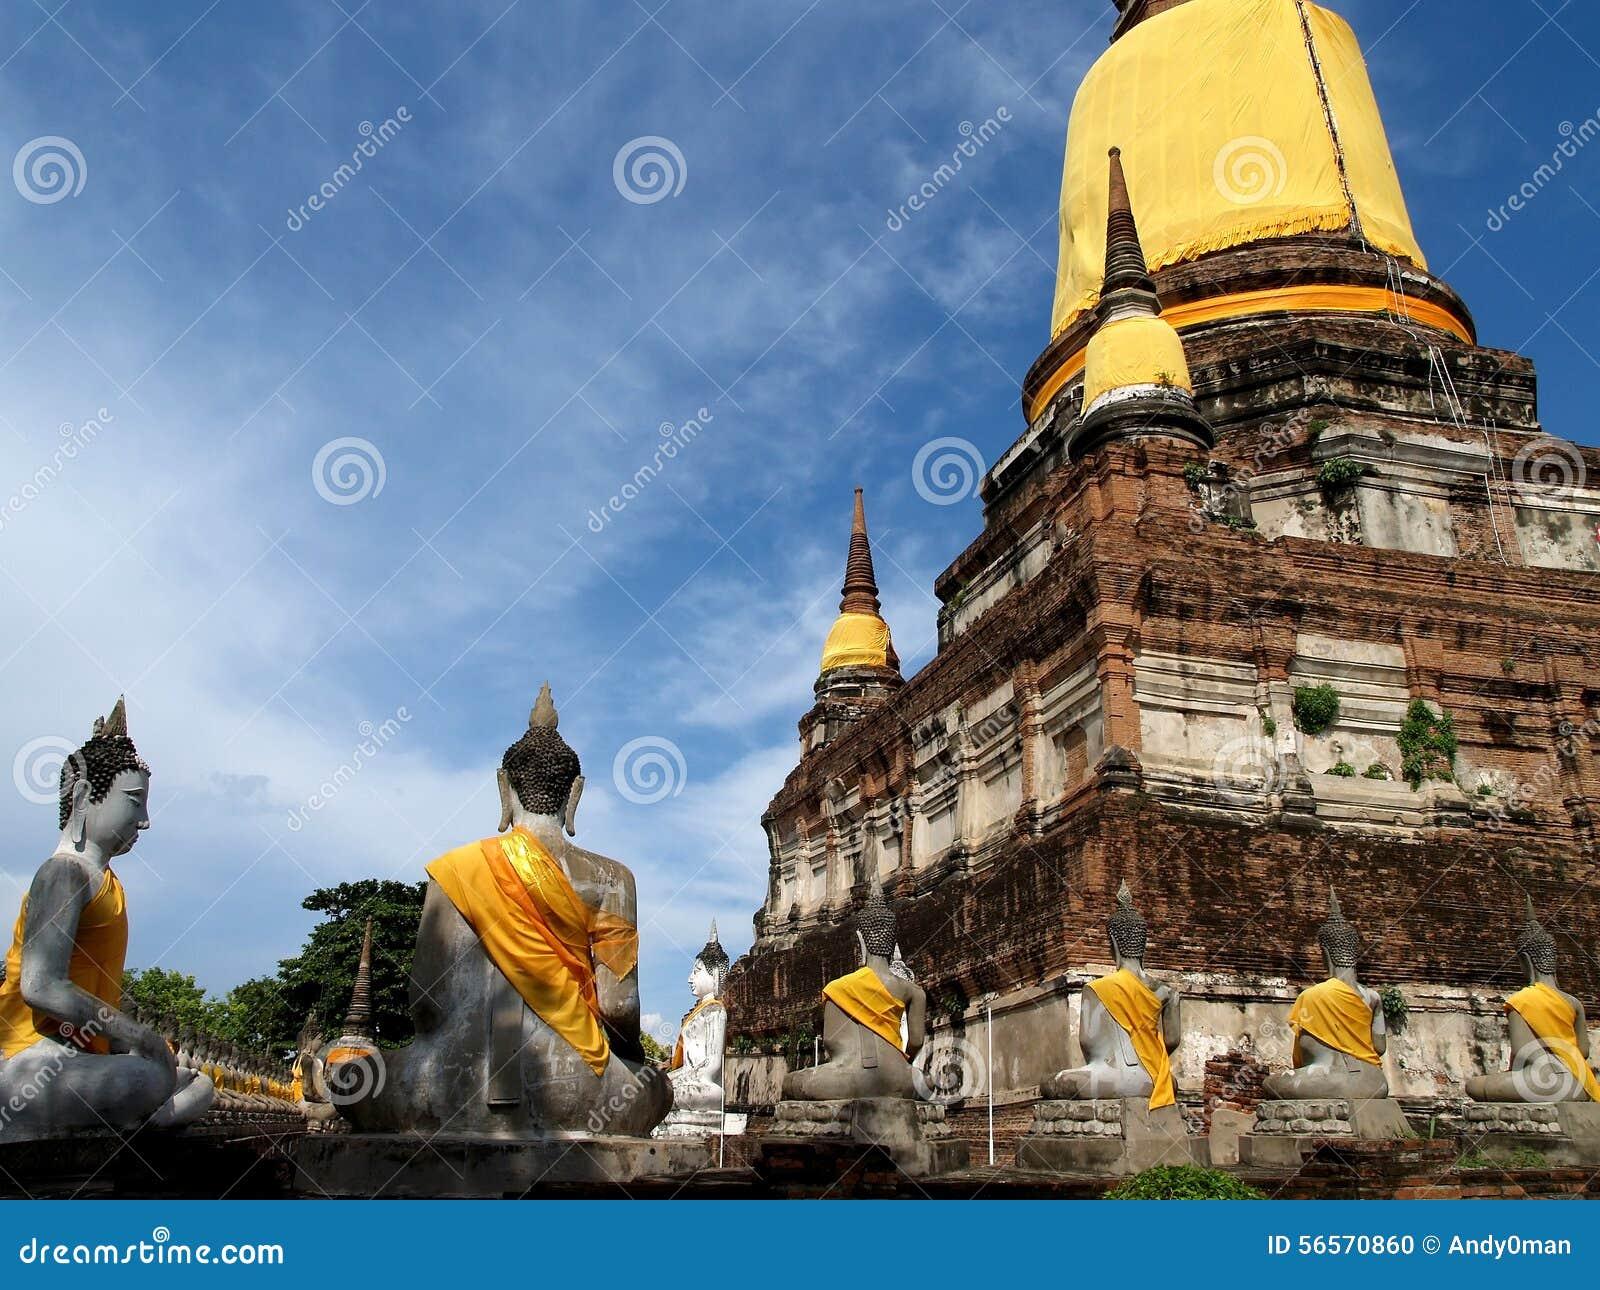 Download Ιστορικός-πάρκο Ayutthaya στοκ εικόνες. εικόνα από ουρανός - 56570860